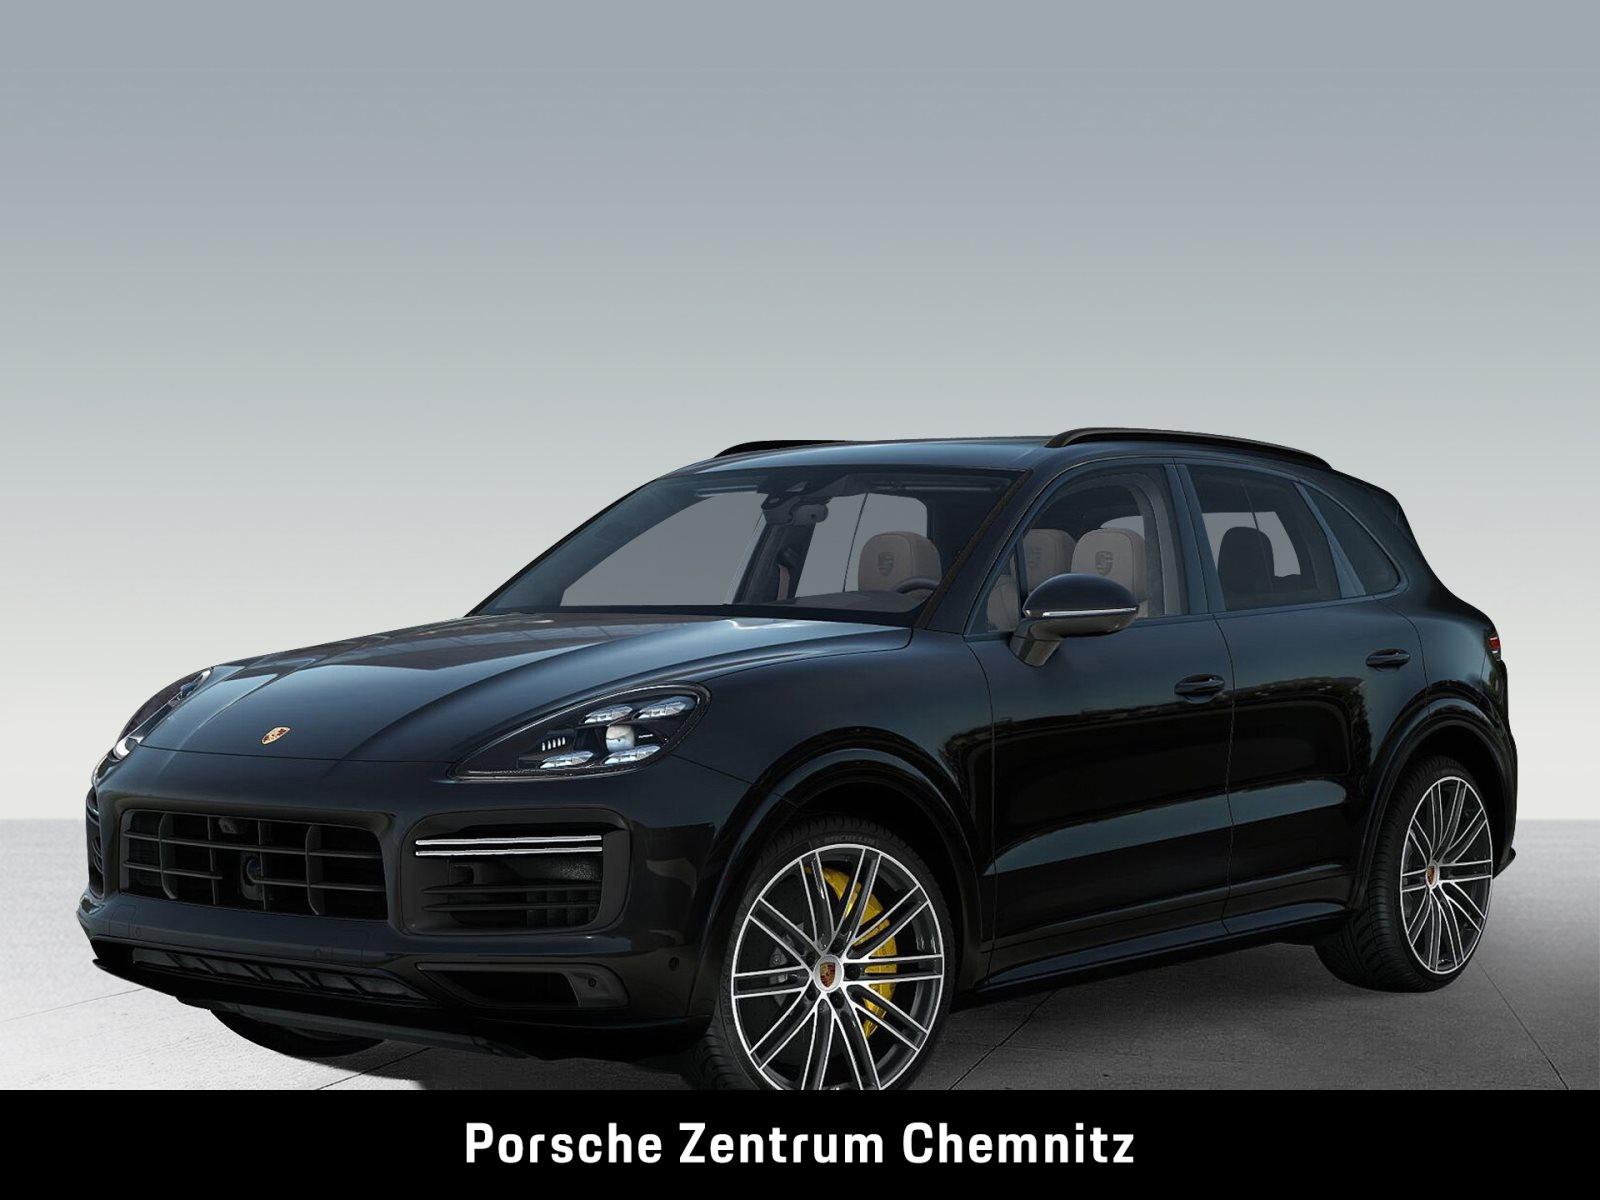 Porsche Cayenne Turbo PCCB,Sportabgas,PCCD,22Zoll,Matrix,Sport-Design-Pkt (9YA)